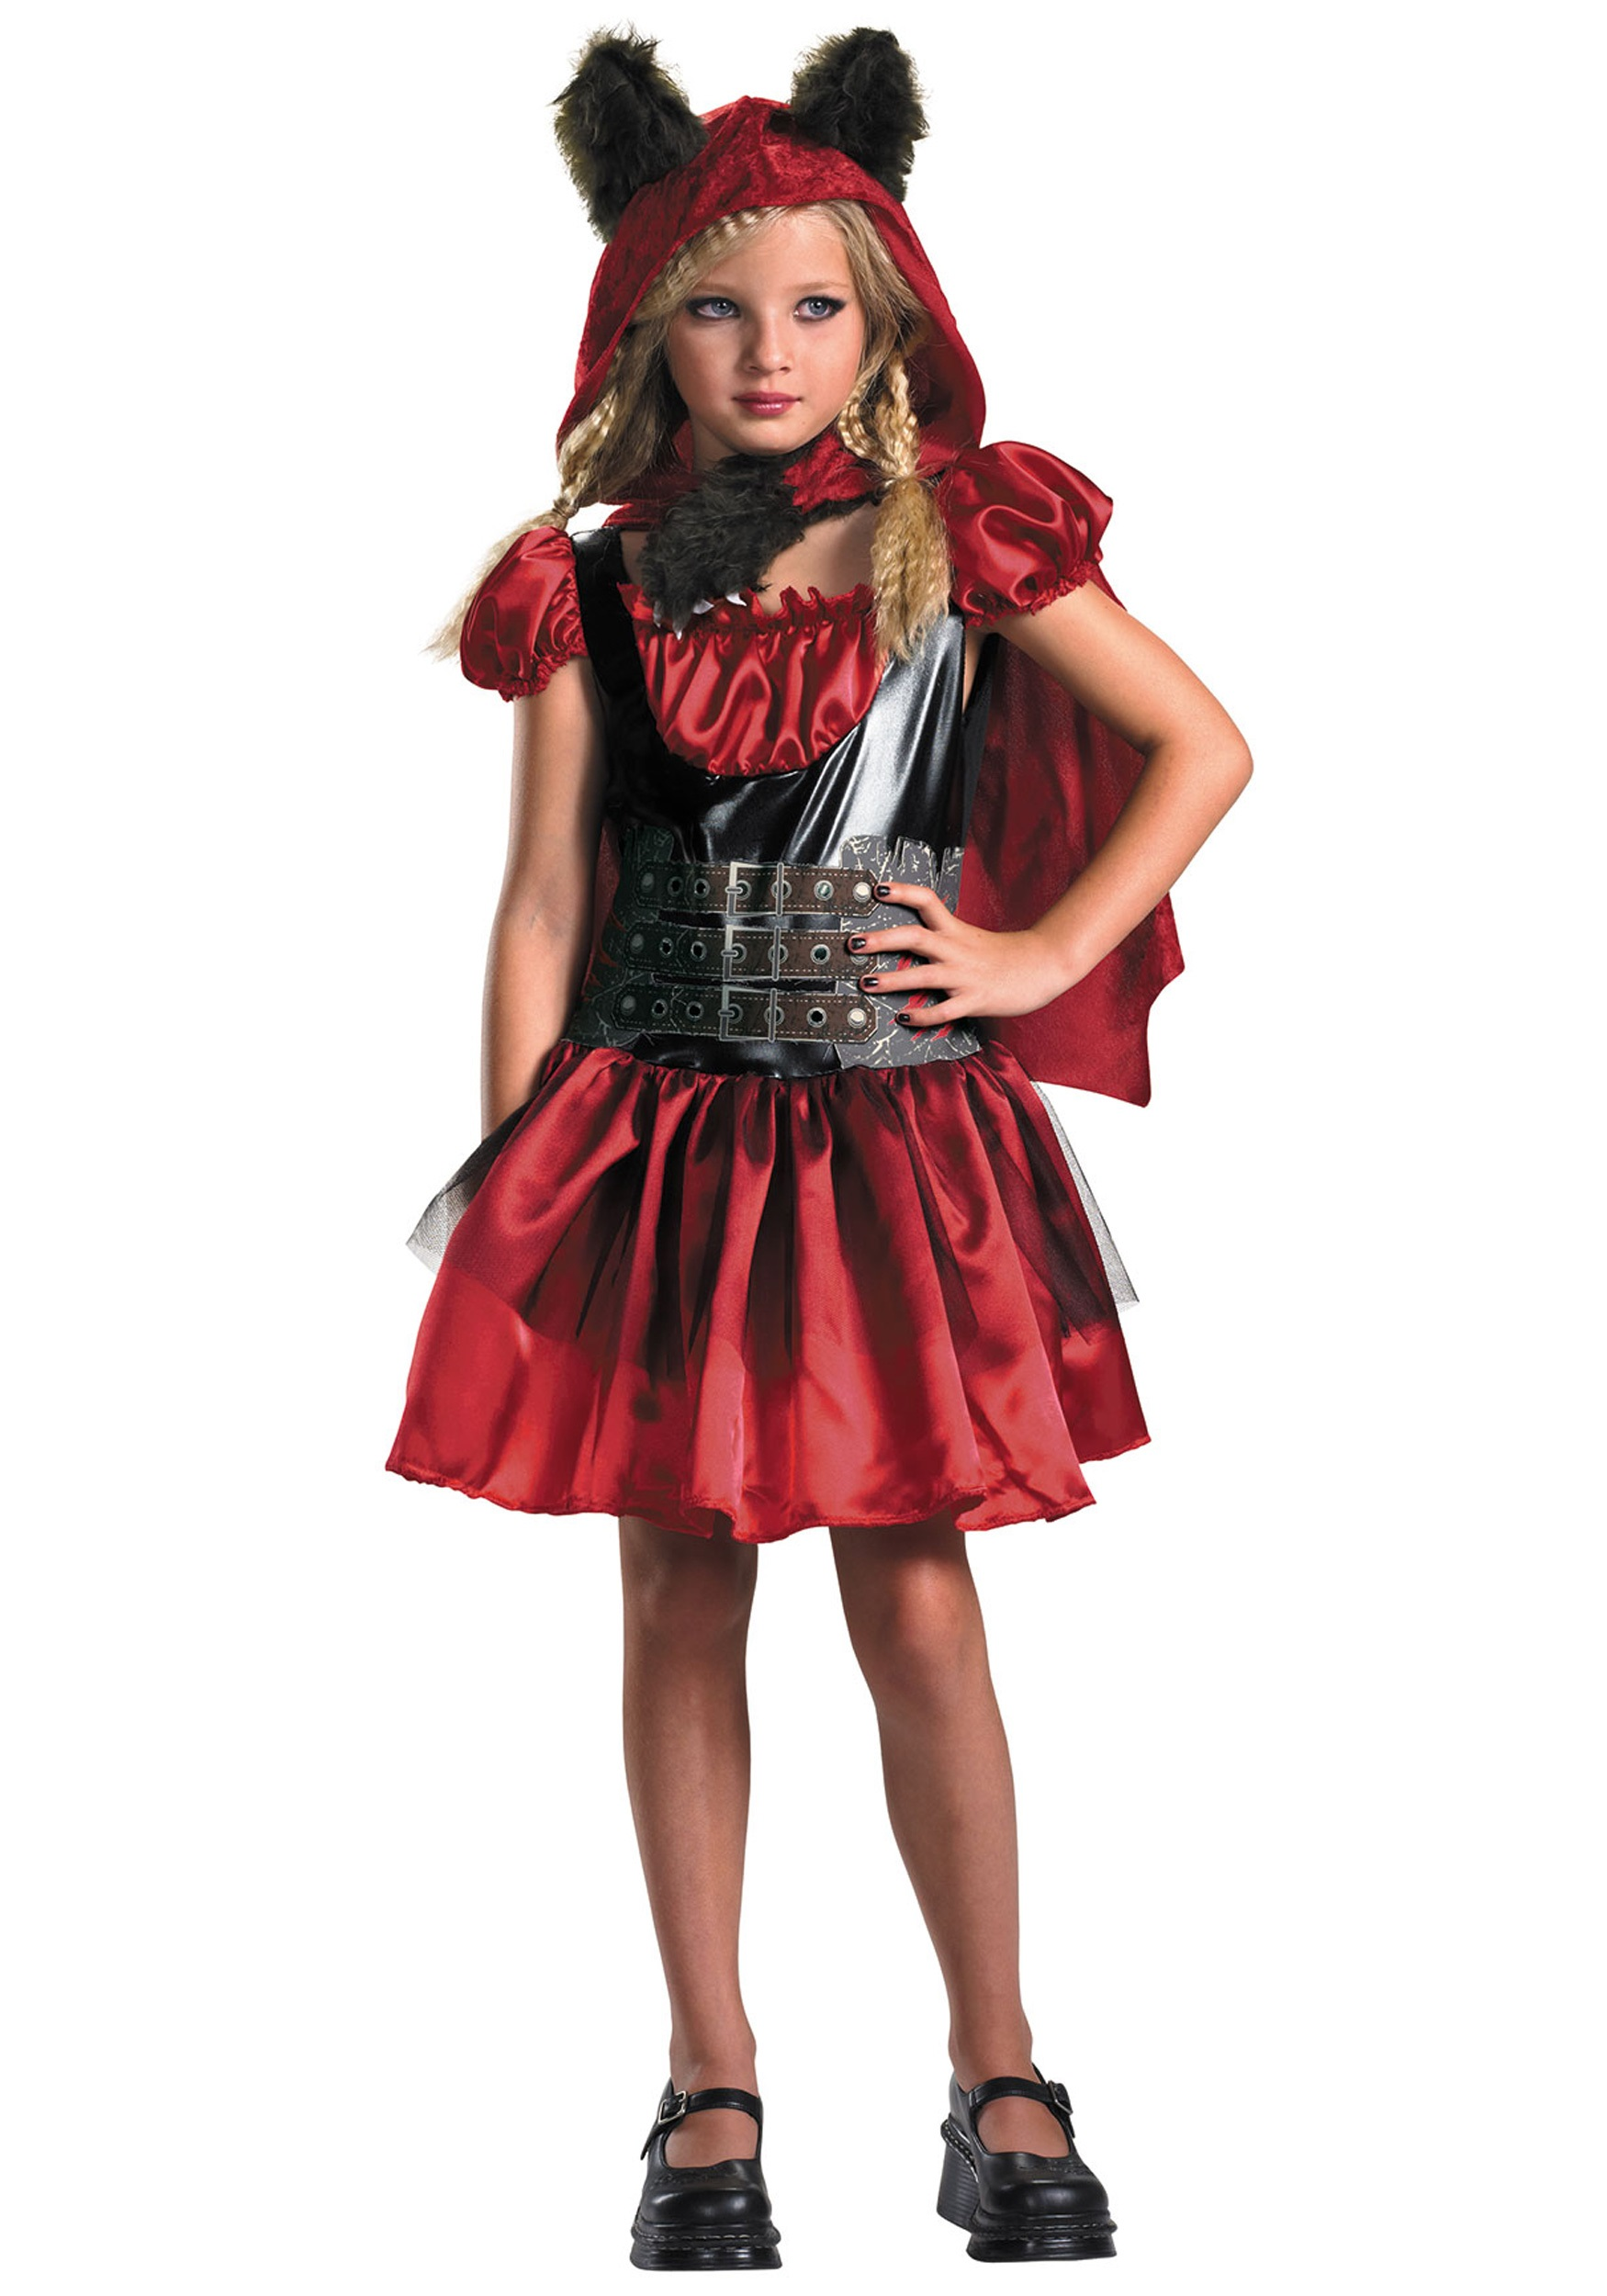 Girls Red Riding Rage Costume Halloween Costume Ideas 2019